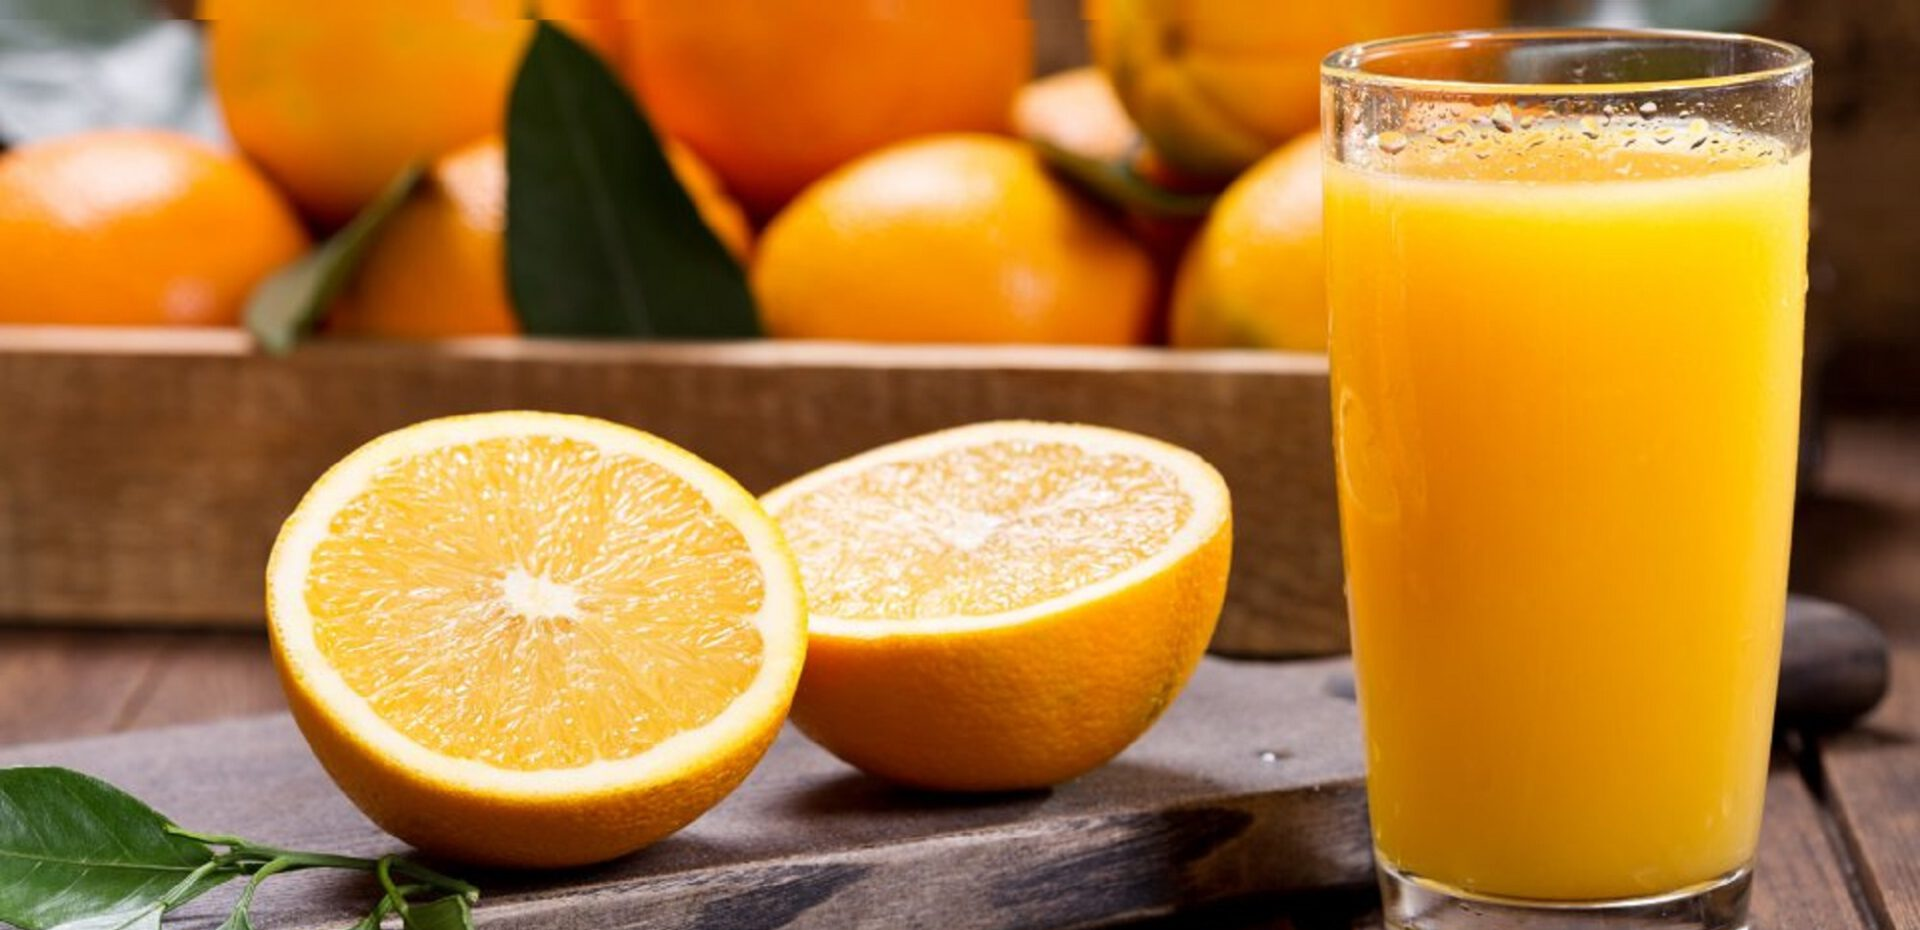 خواص شگفت انگیز آب پرتقال